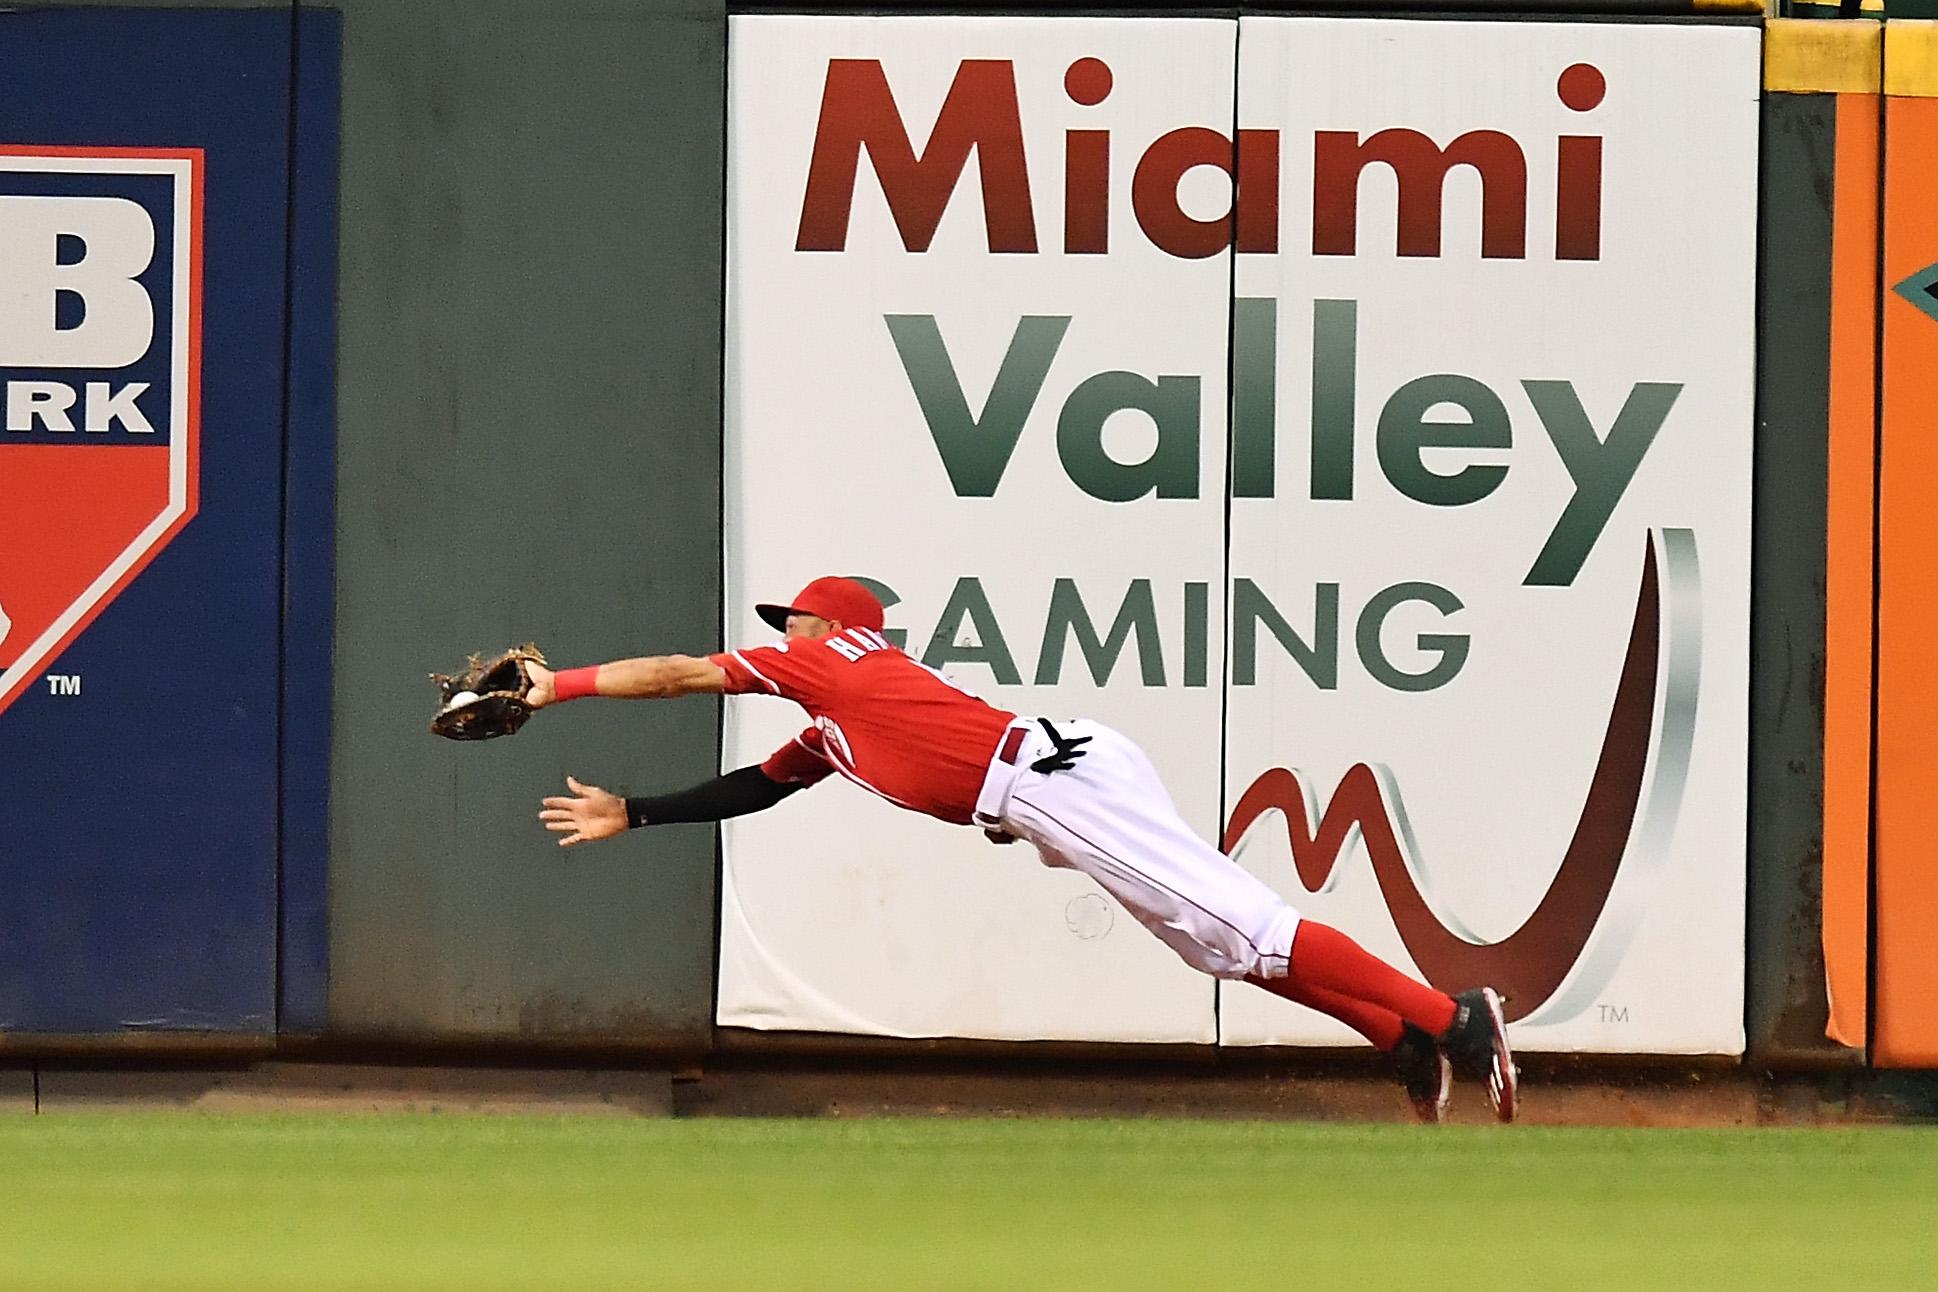 Billy Hamilton can fly, man